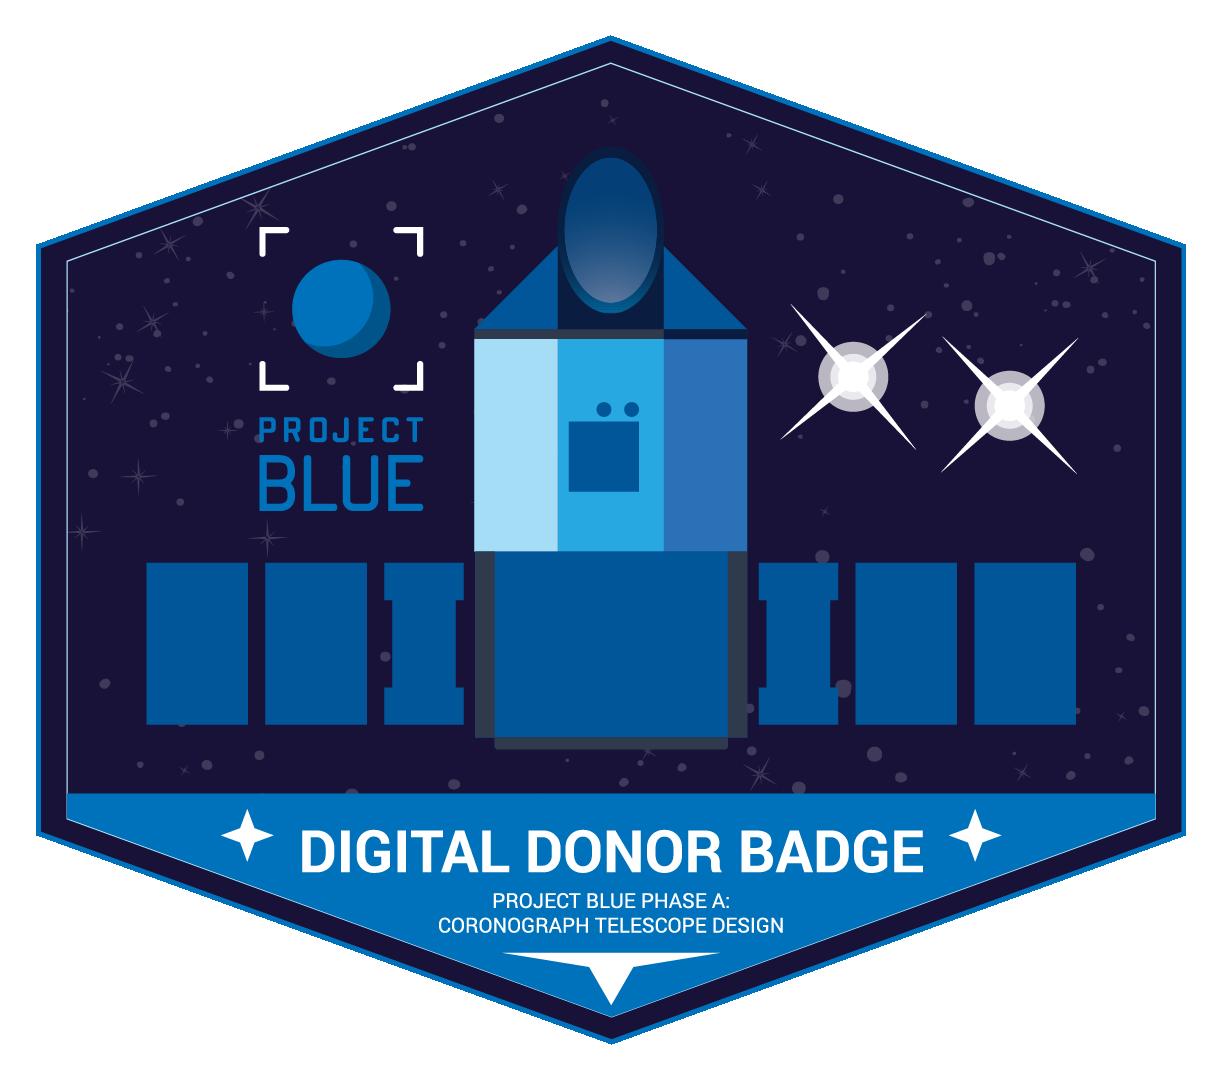 Digital Donor Badge